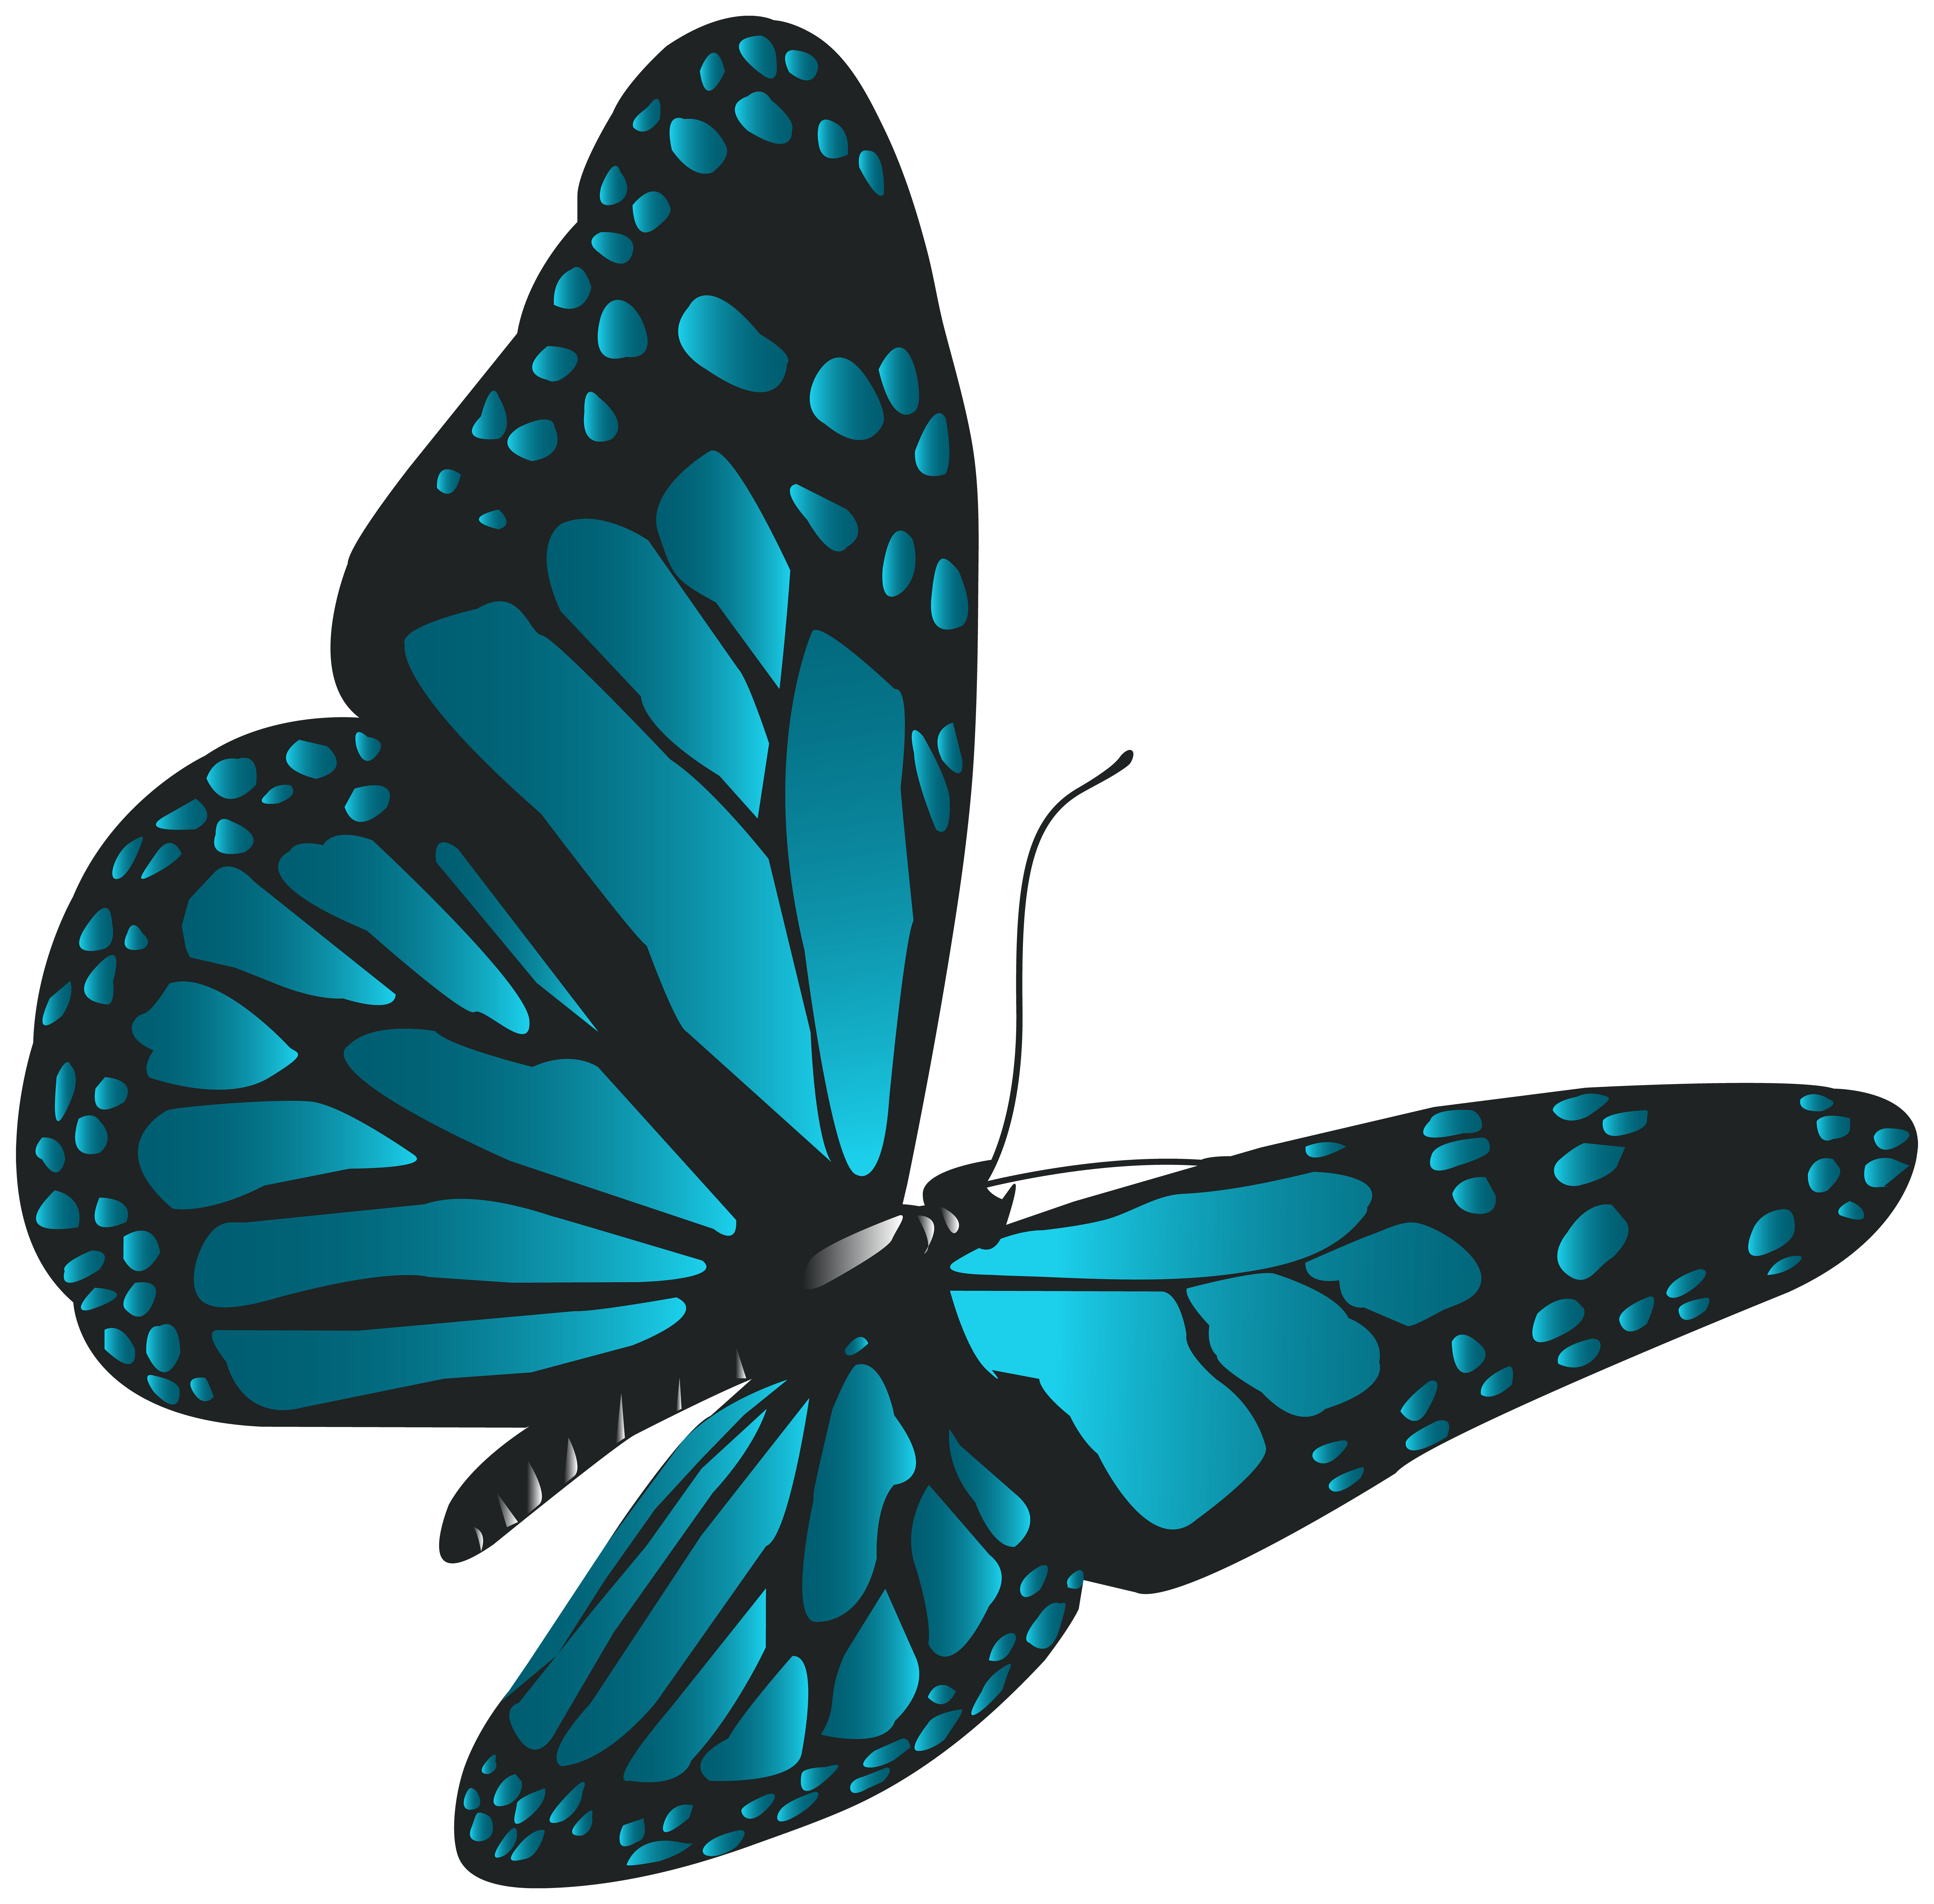 Animated Butterfly Clip Art | David Simchi-Levi